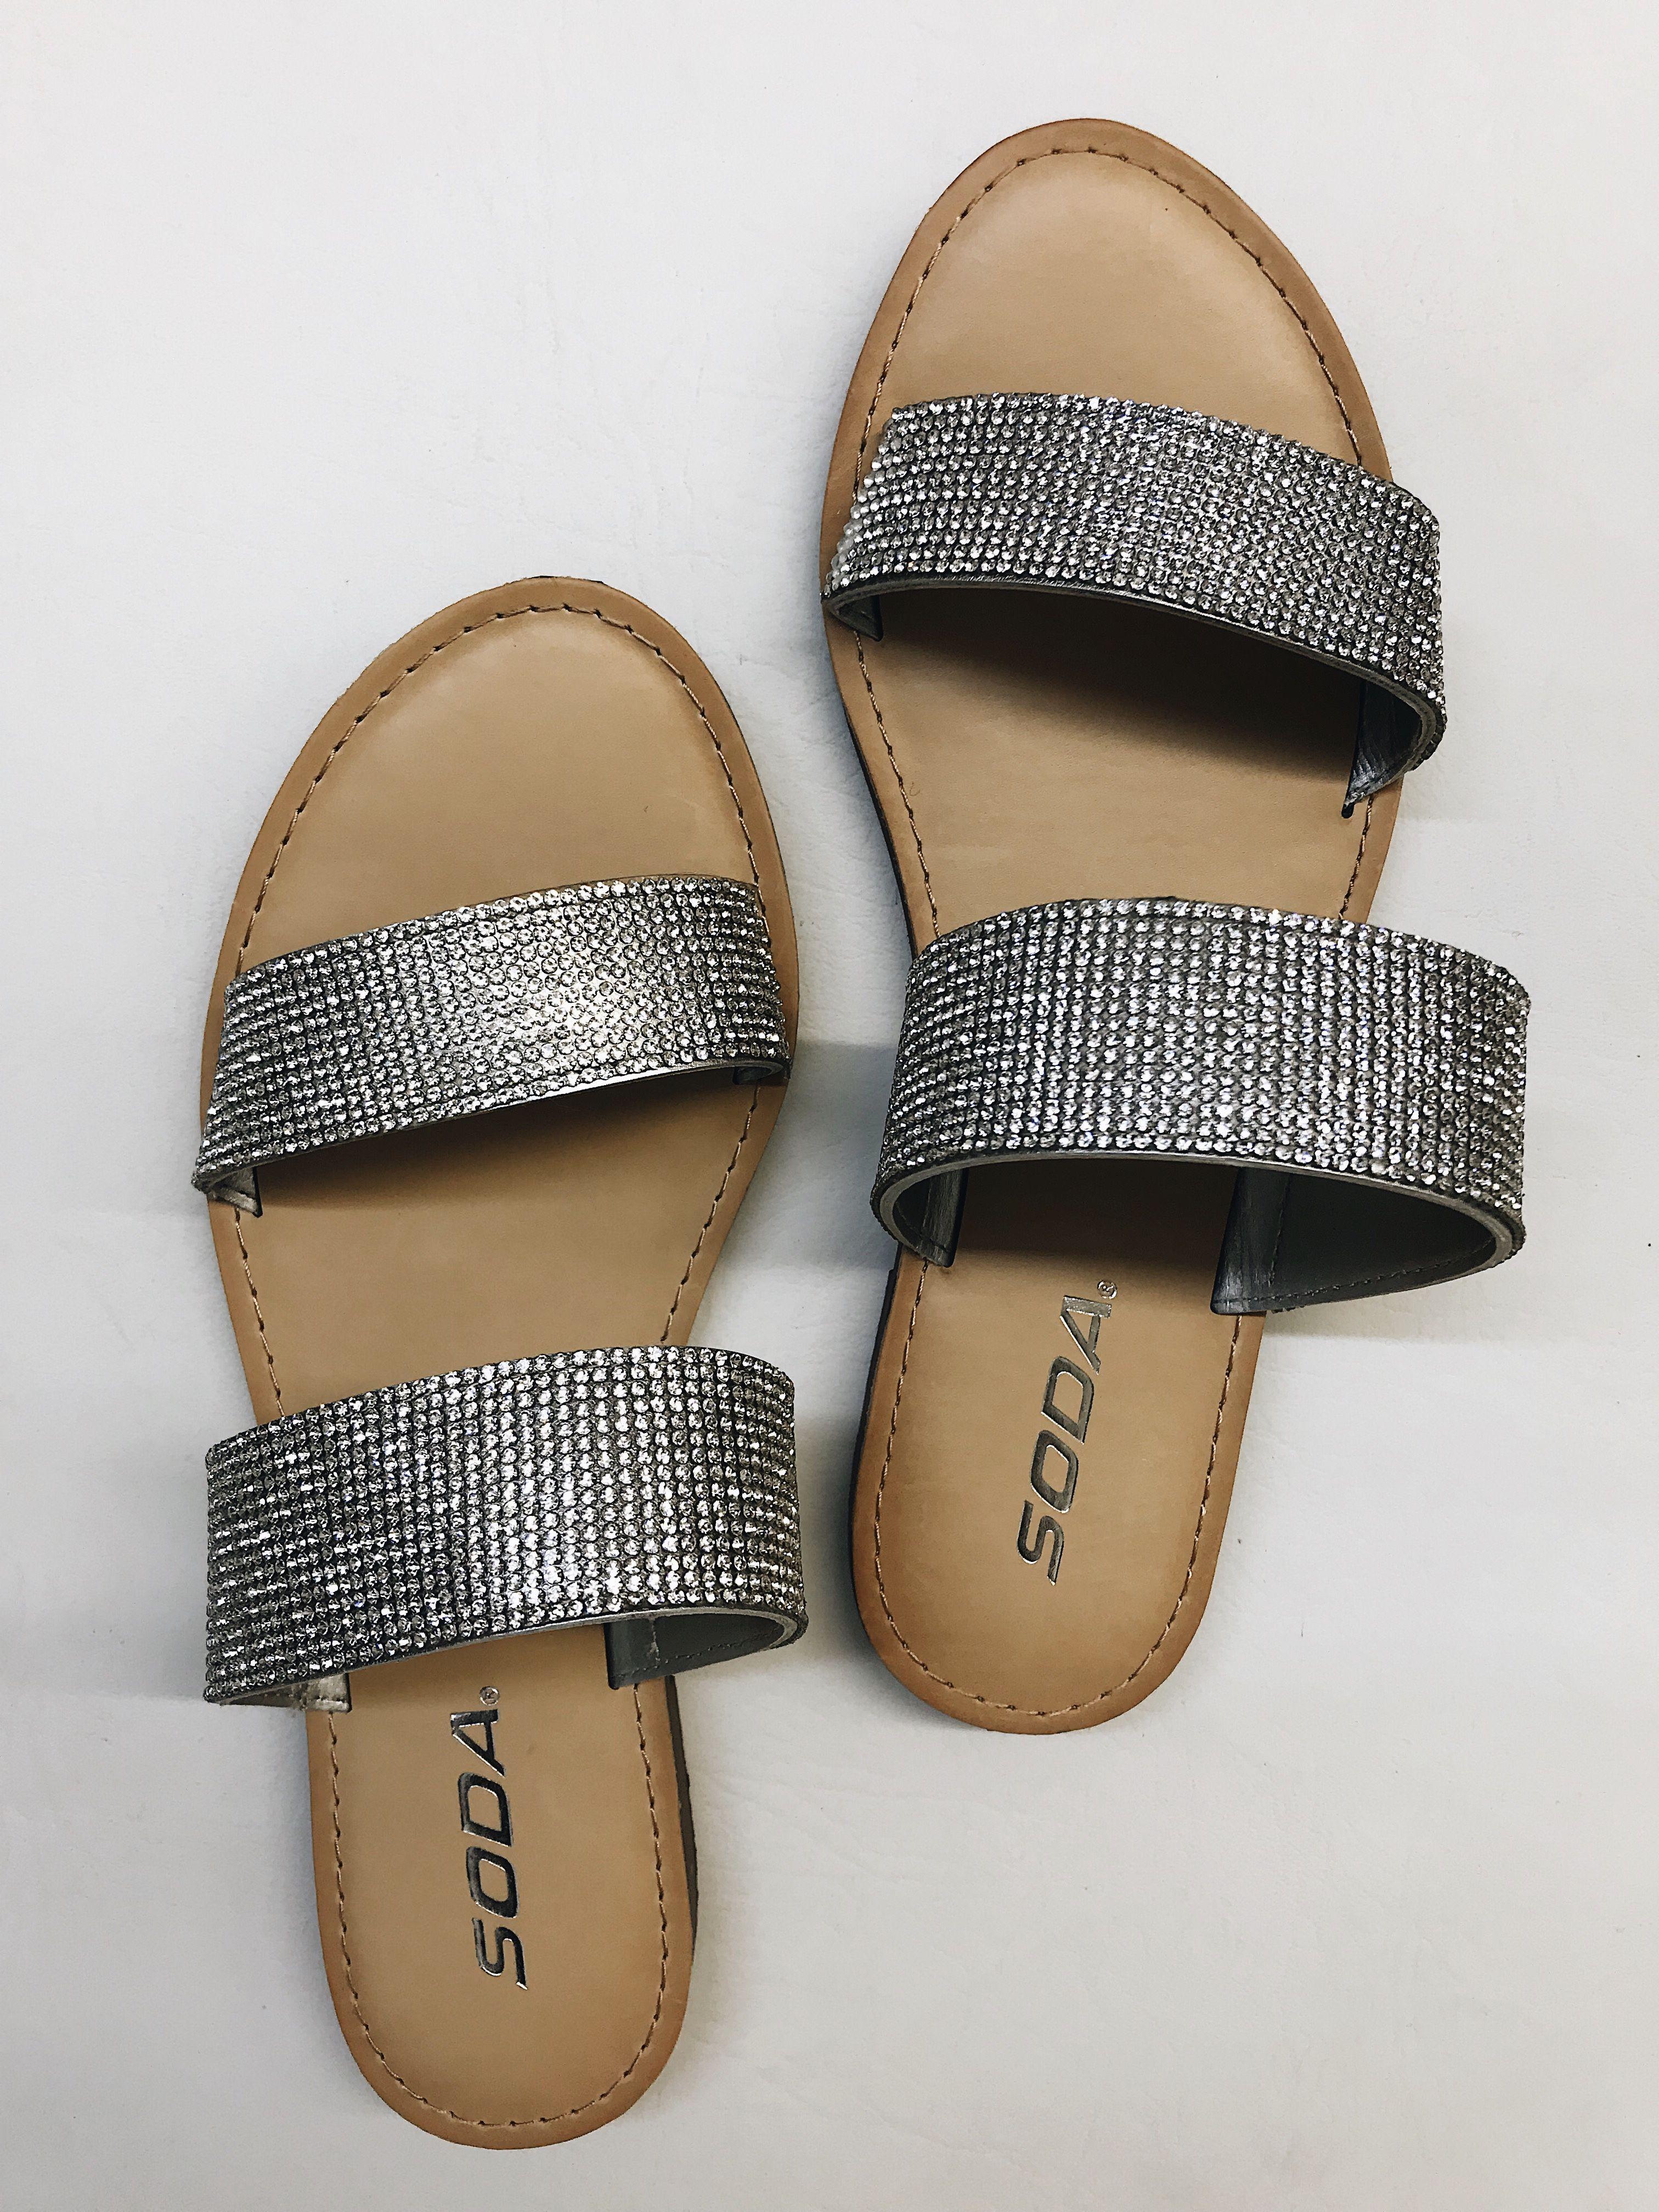 985a19544 #sandal #slide #slidesandals #silver #silvershoes #slipon #sliponshoes  #shoes